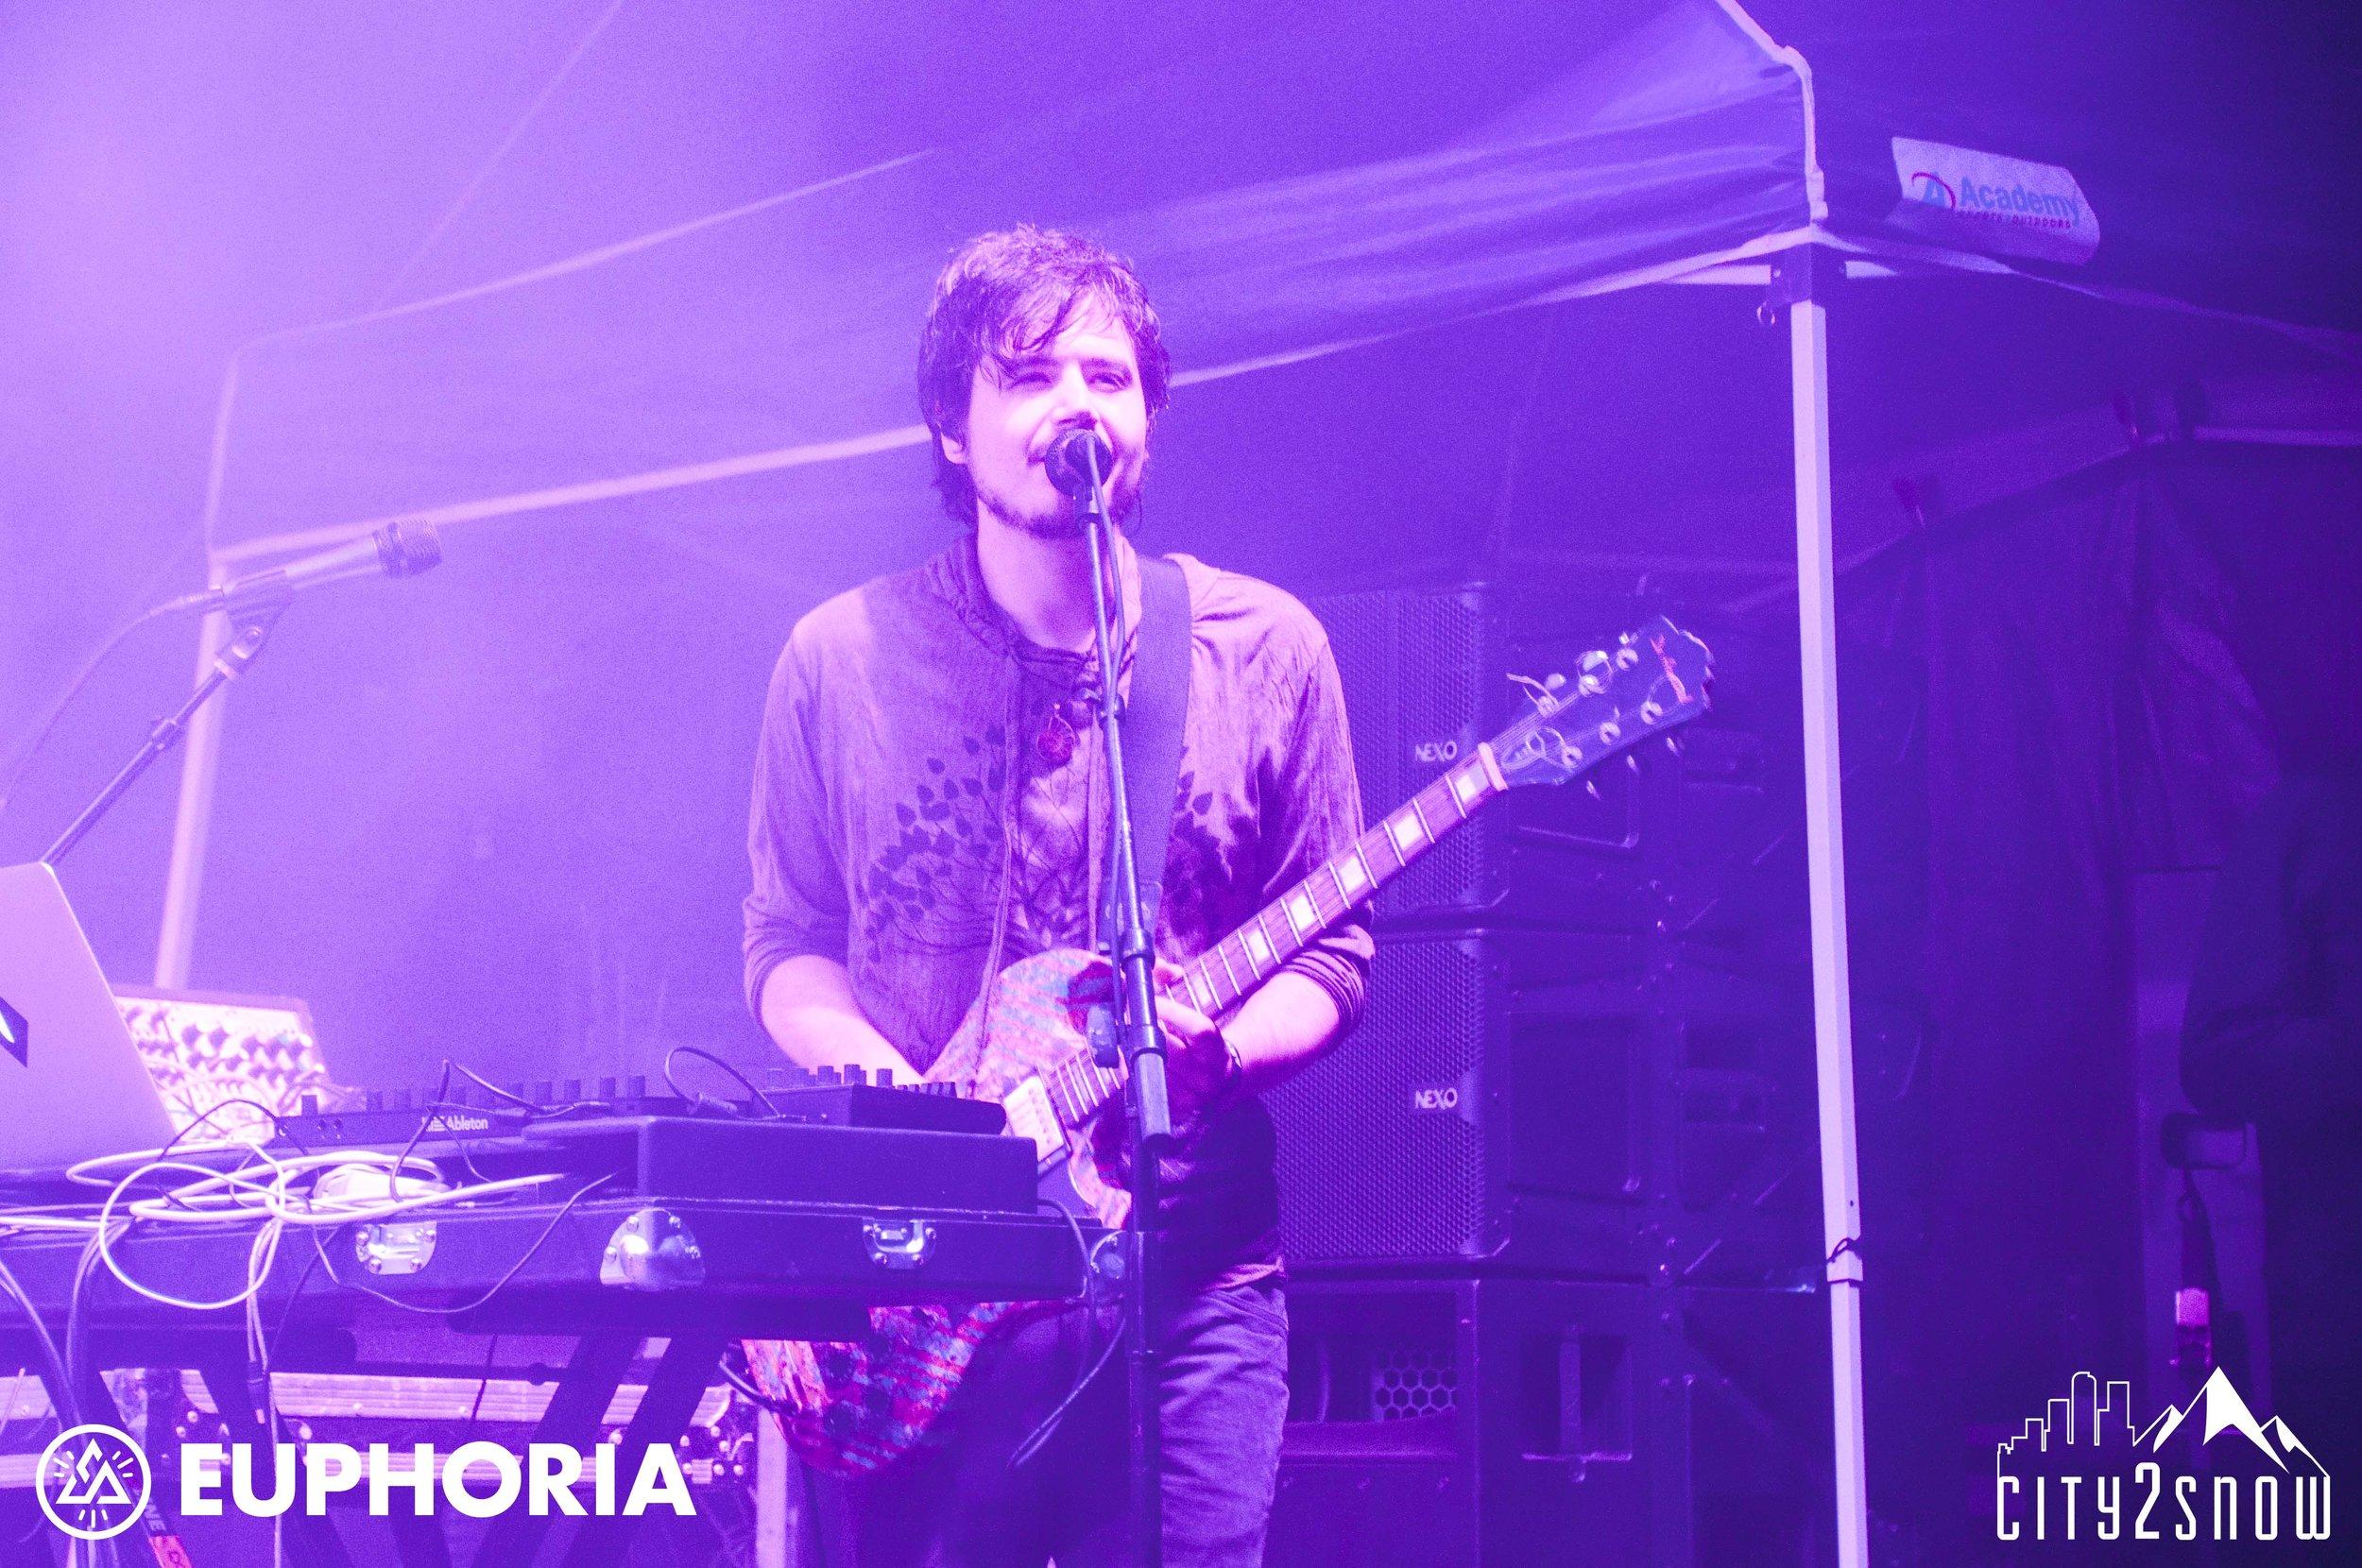 Euphoria-Music-Festival-2017-7.jpg